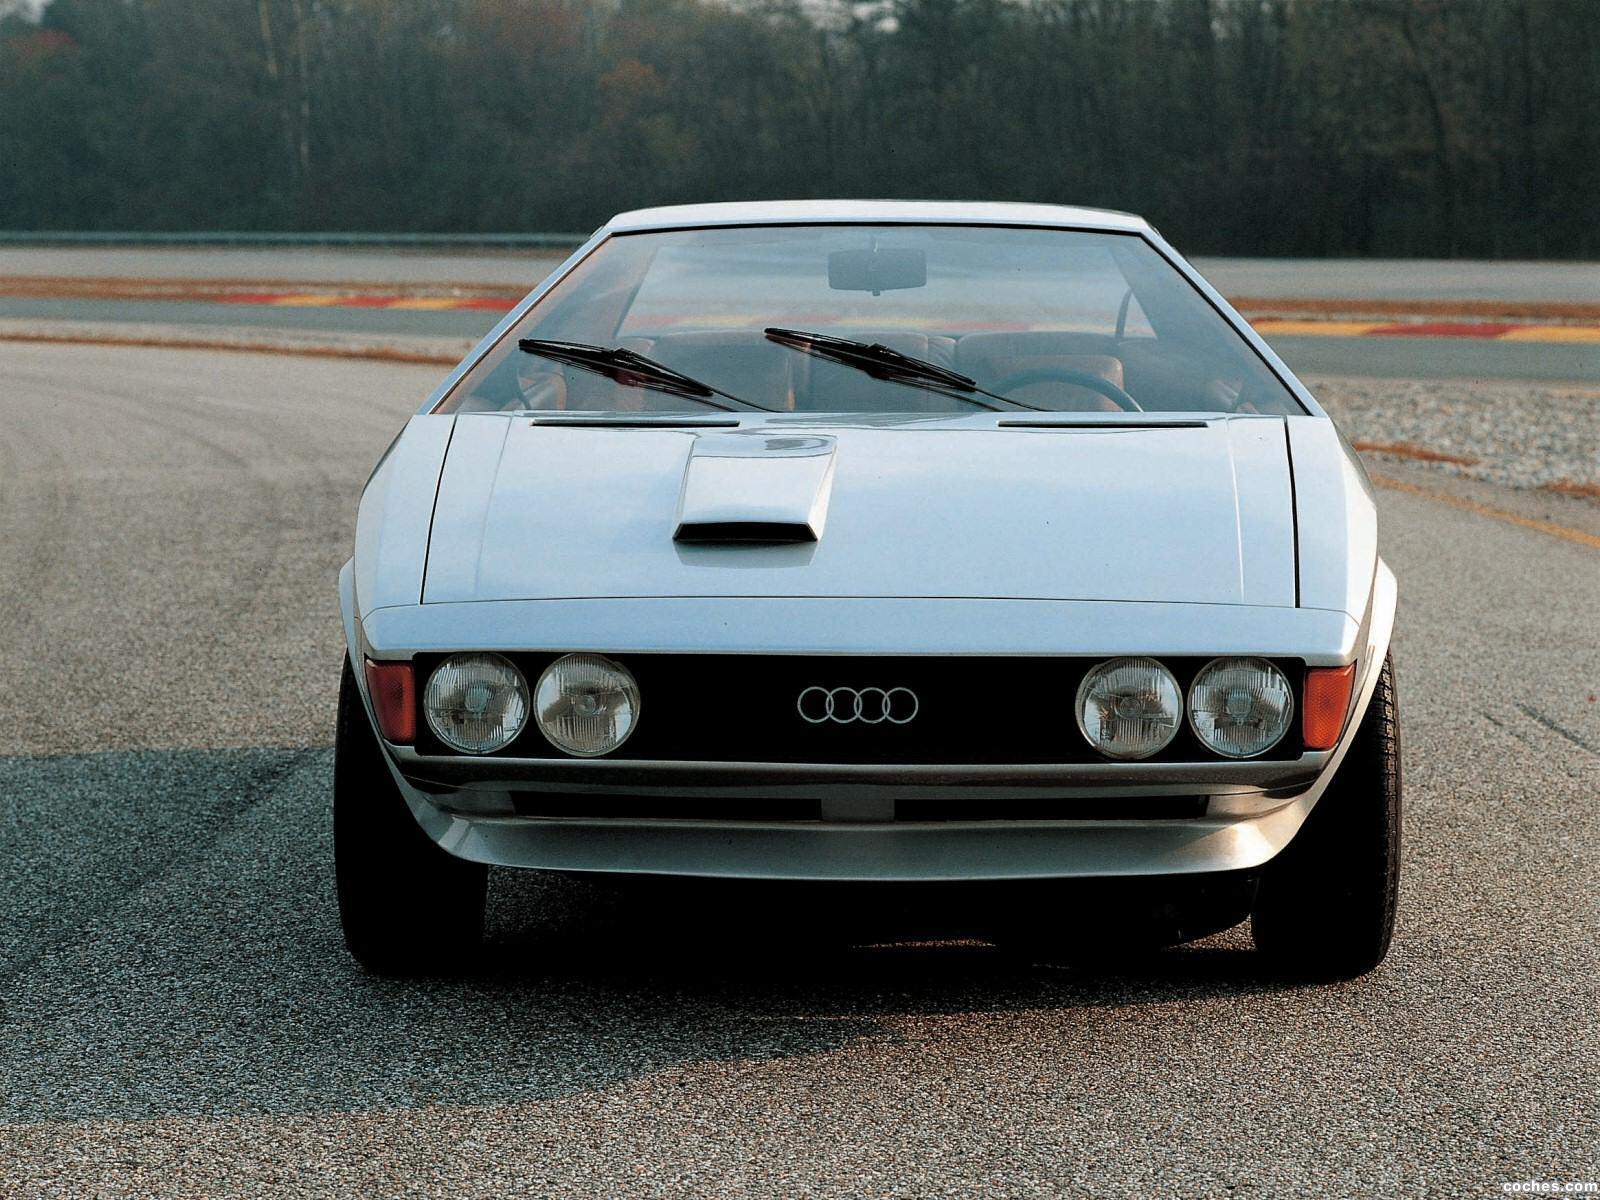 Foto 0 de Italdesign Audi Karmann Asso Di Picche 1973